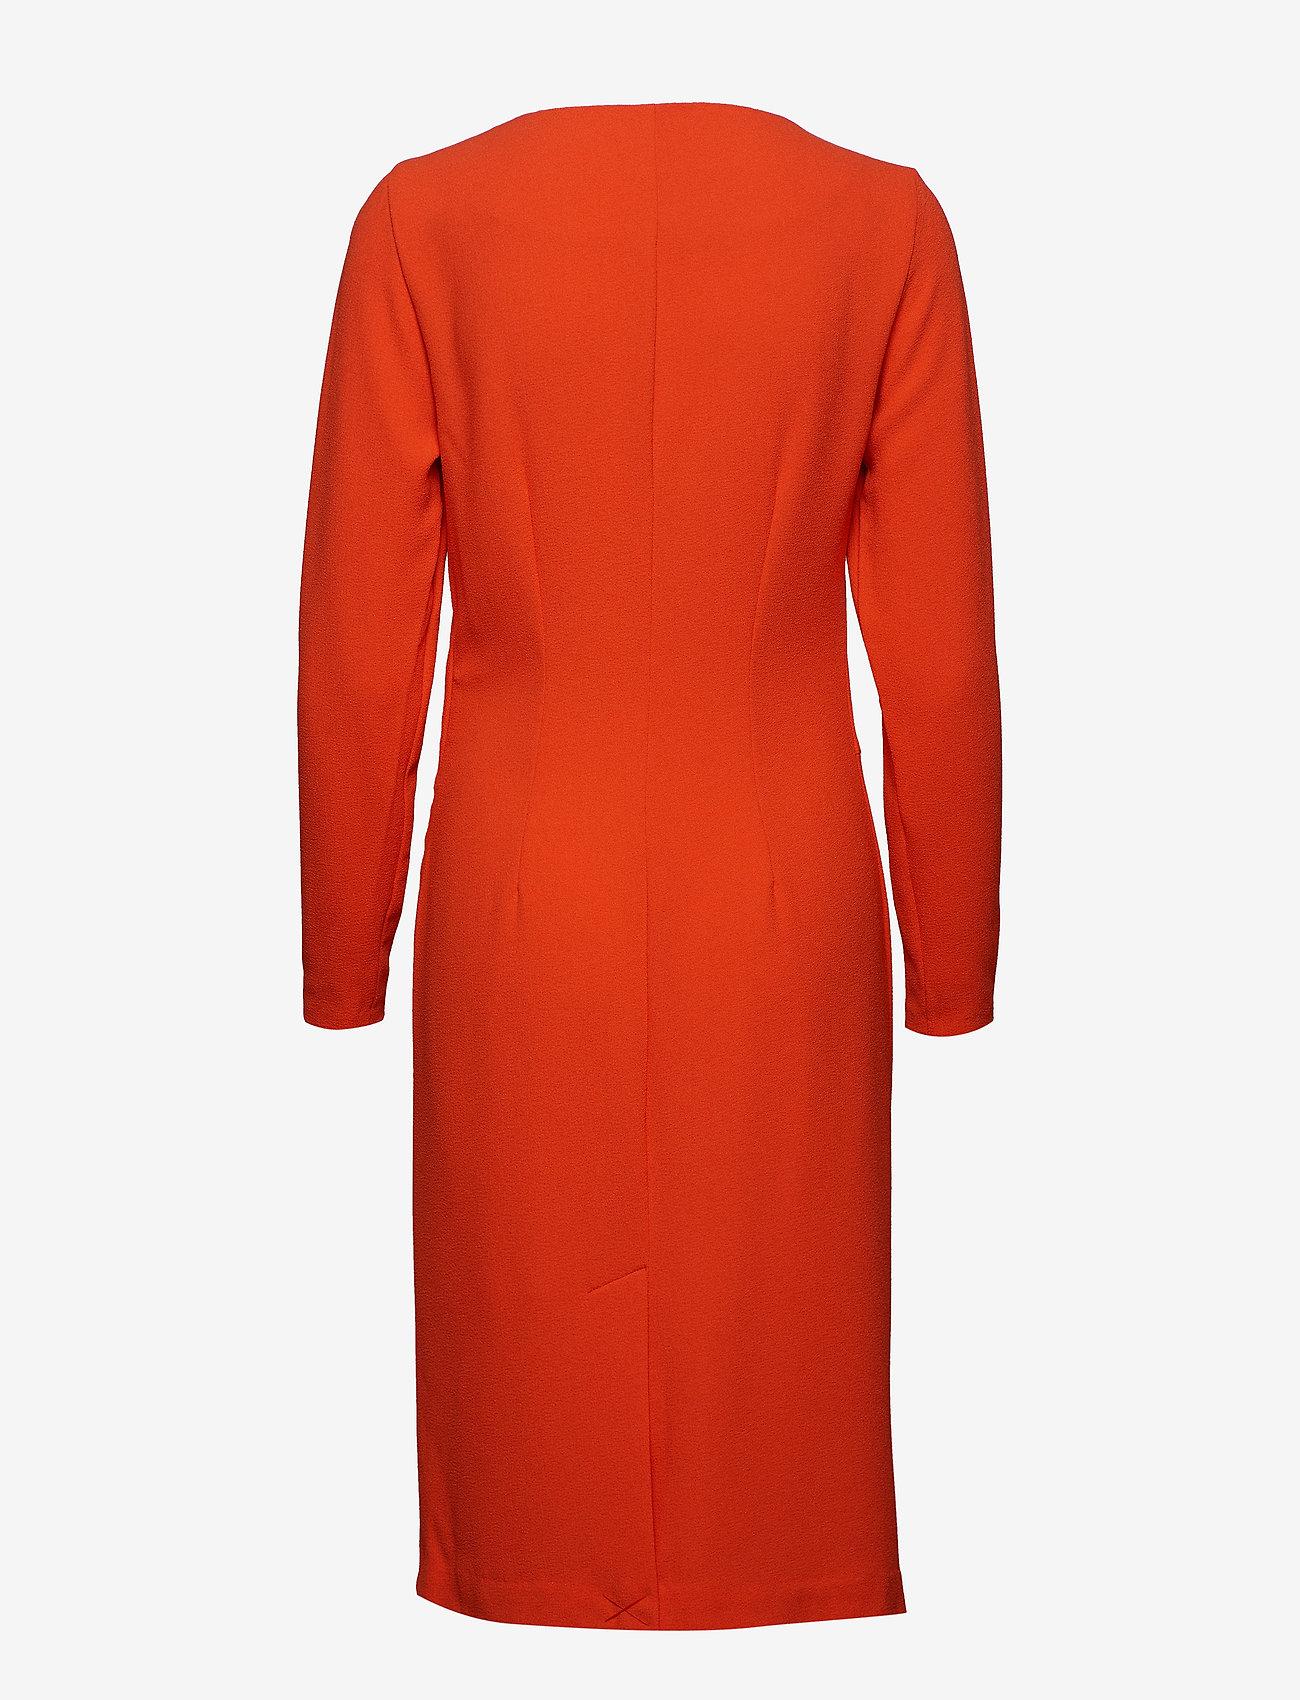 Vila - VISEALO L/S KNOT DRESS - midi kjoler - cherry tomato - 1